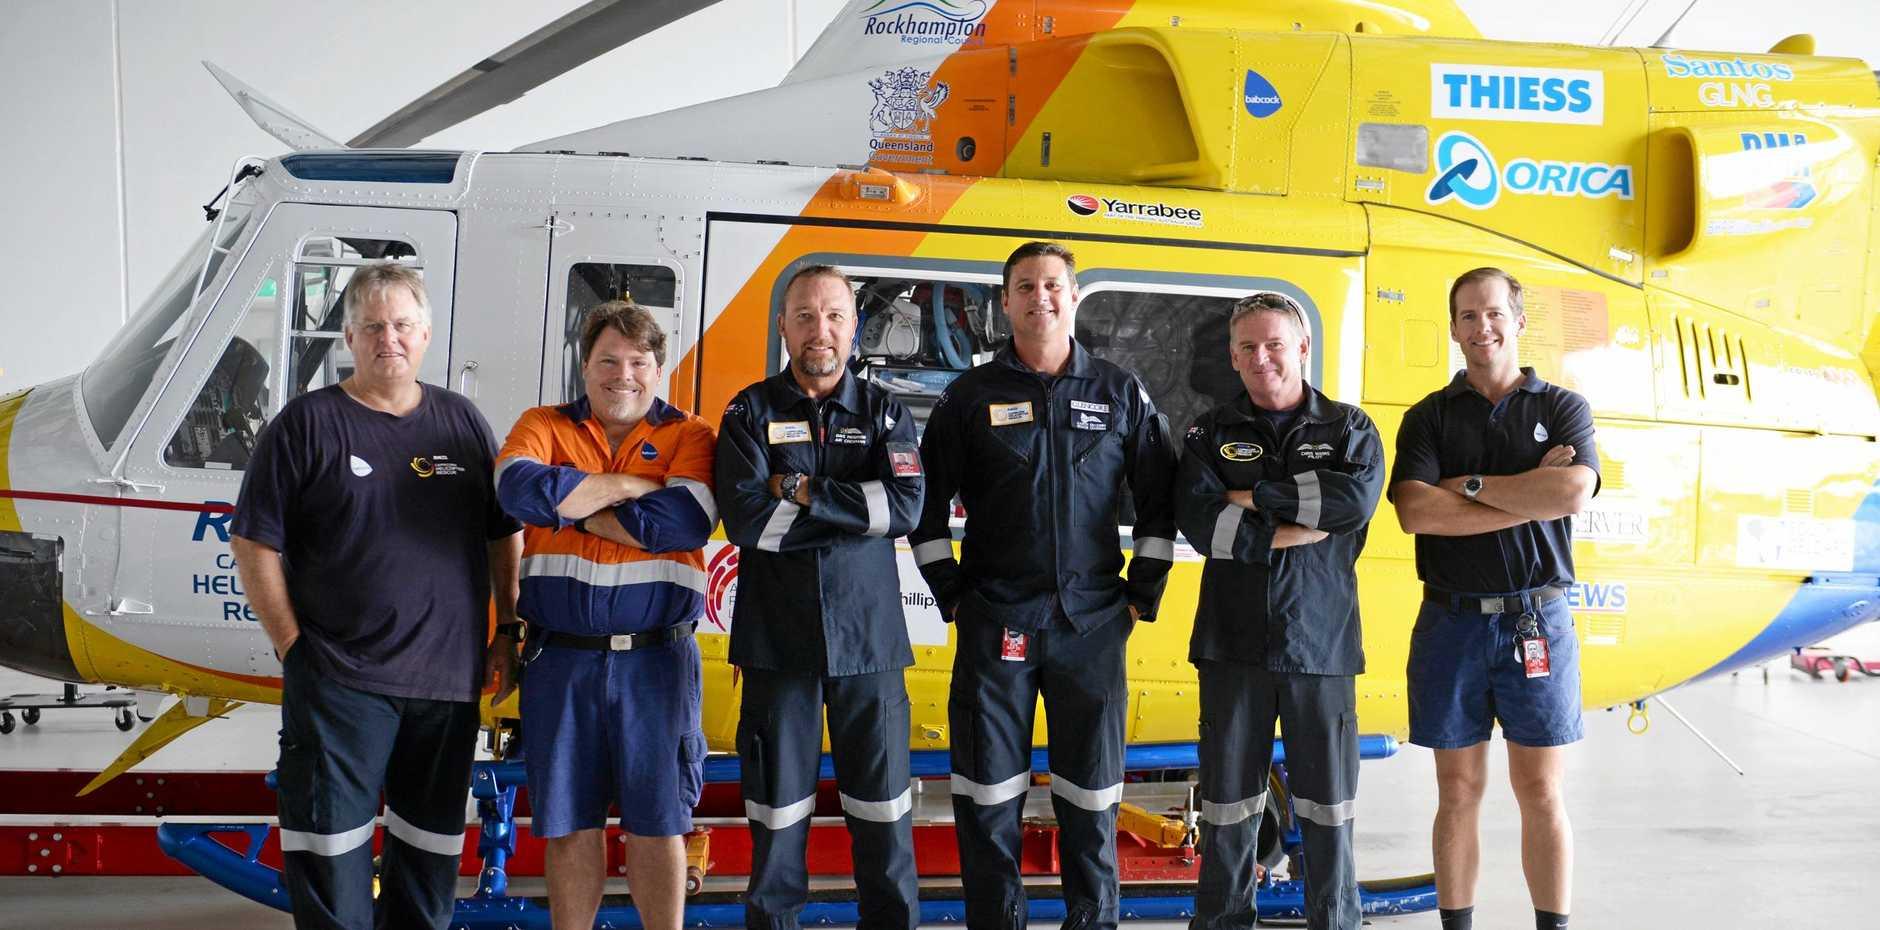 RACQ Capricorn Helicopter Rescue crew members Mitch Vernon, Derek Tessmann, Dave Paterson, Garth Snaidero, Chris Manns and Joe Chandler .